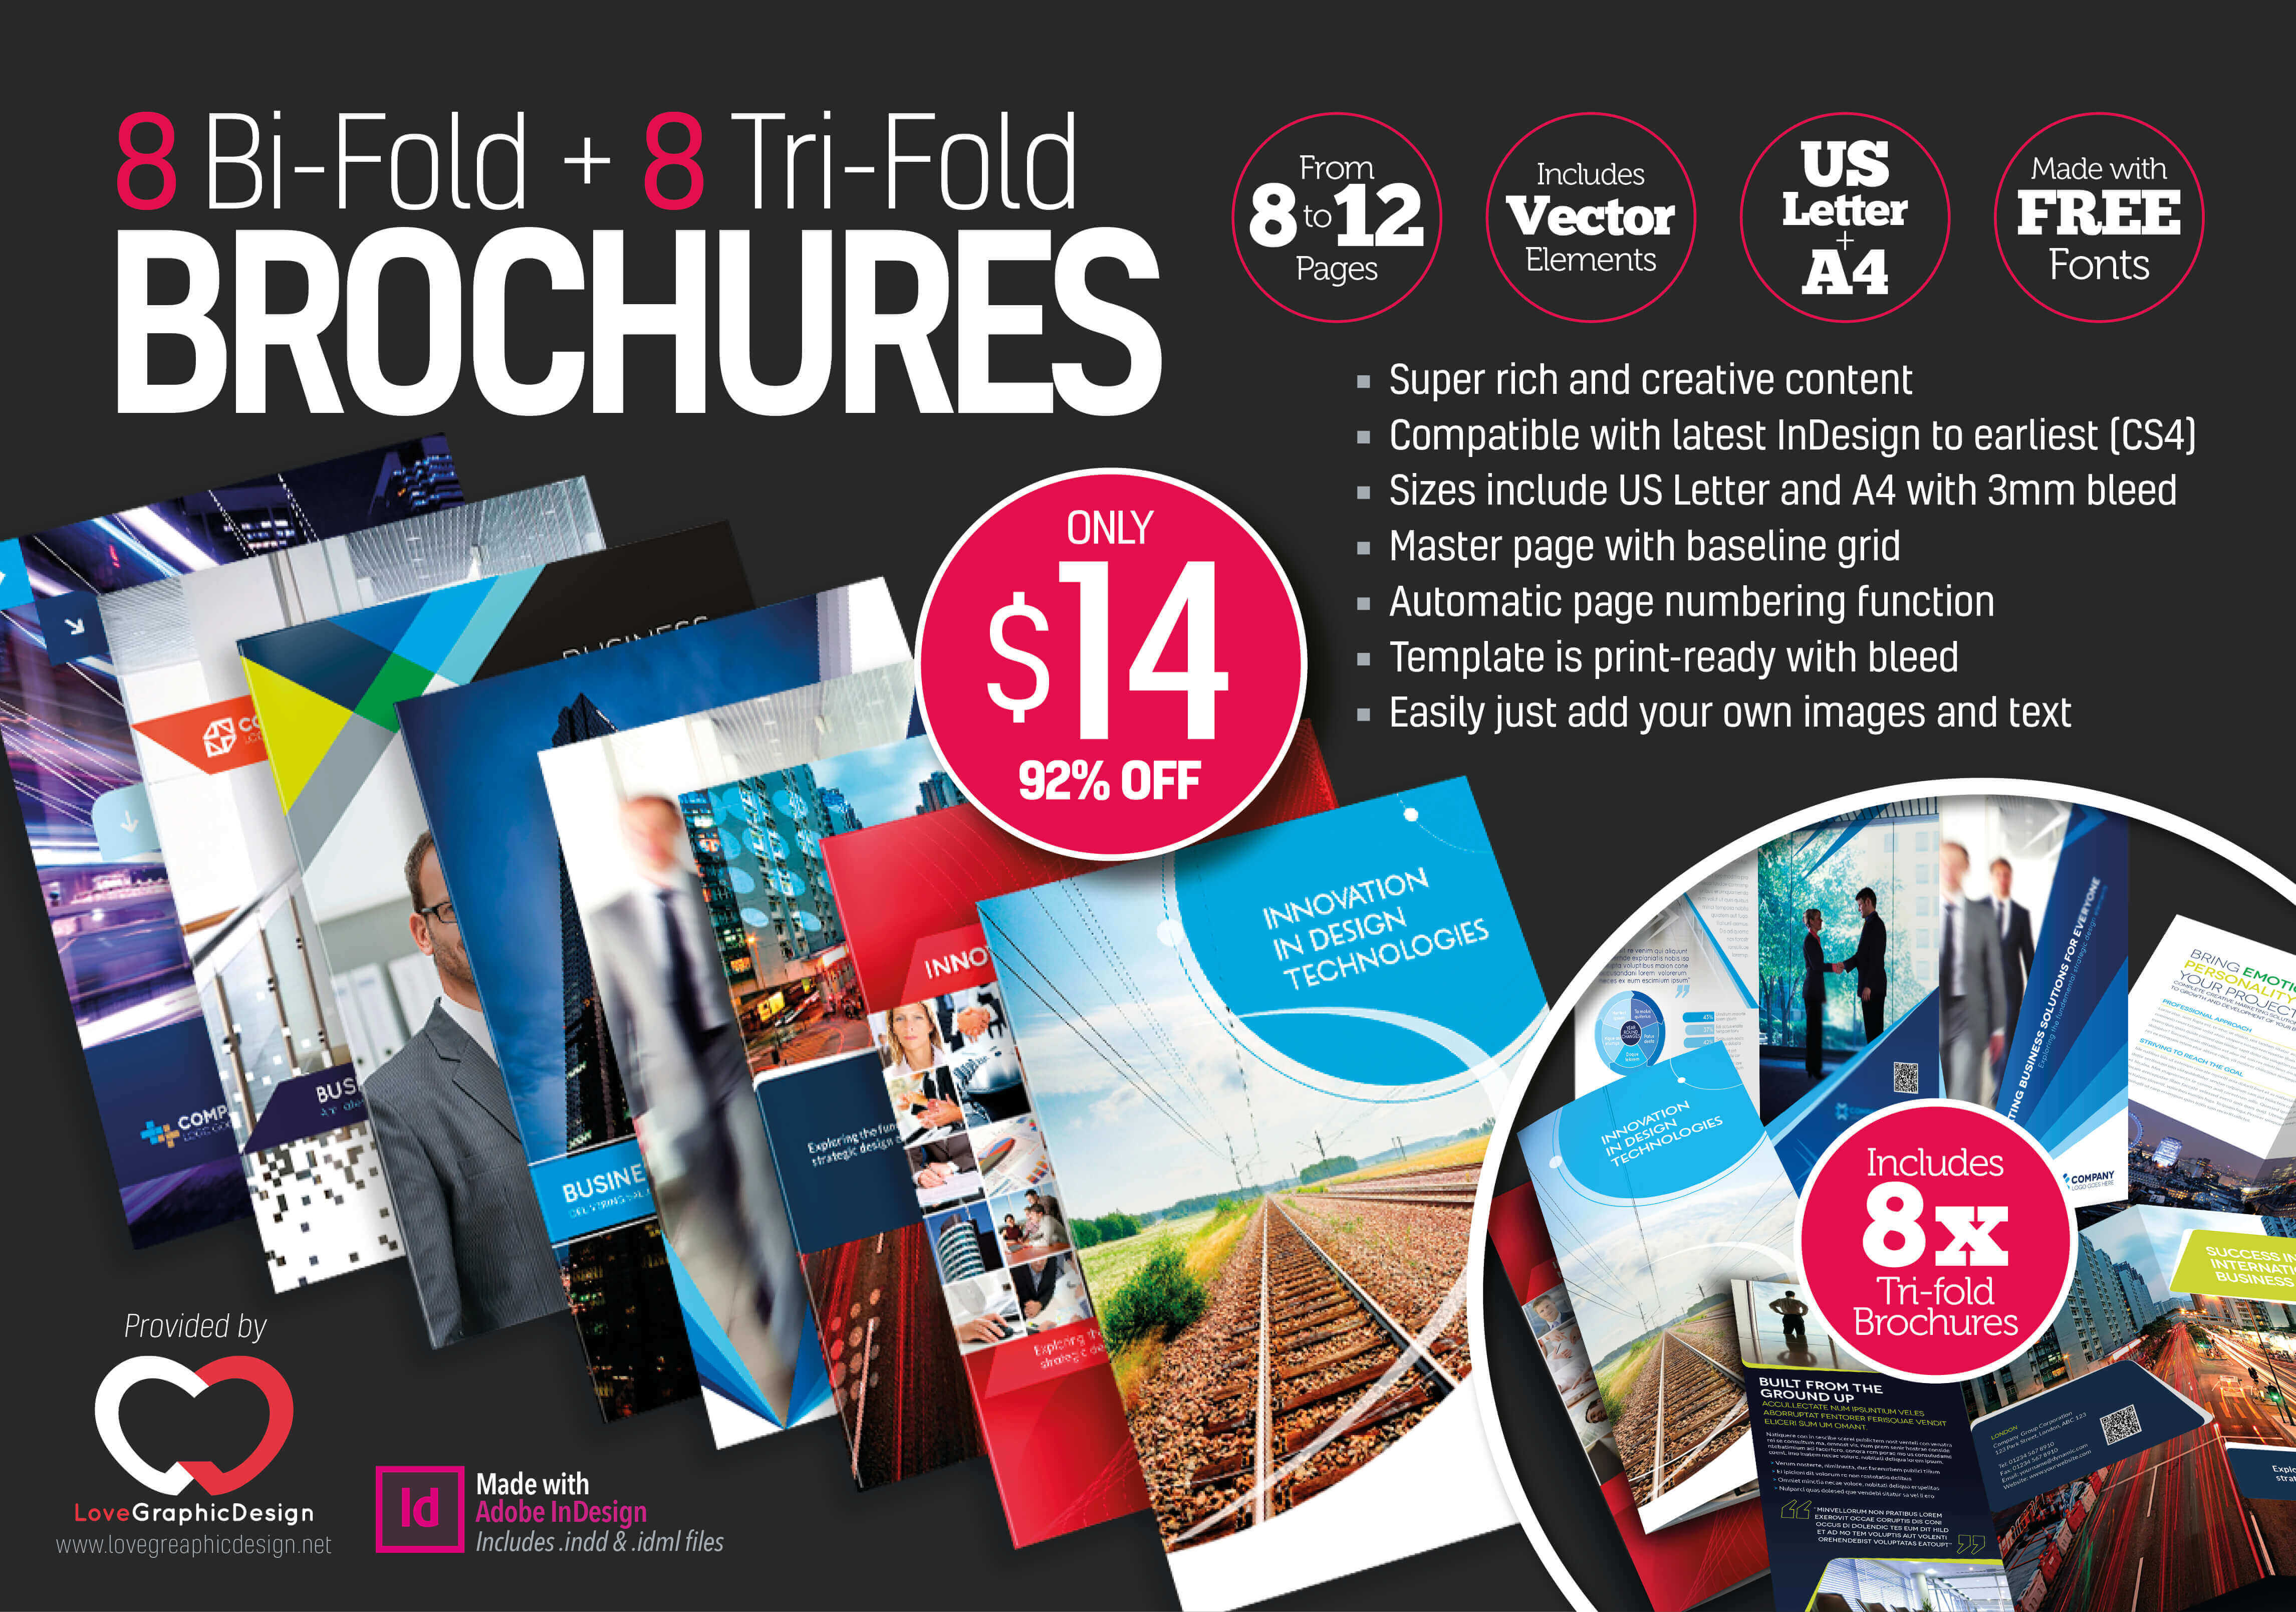 8 Print-Ready InDesign Bi-Fold & Tri-Fold Brochure Templates - only ...